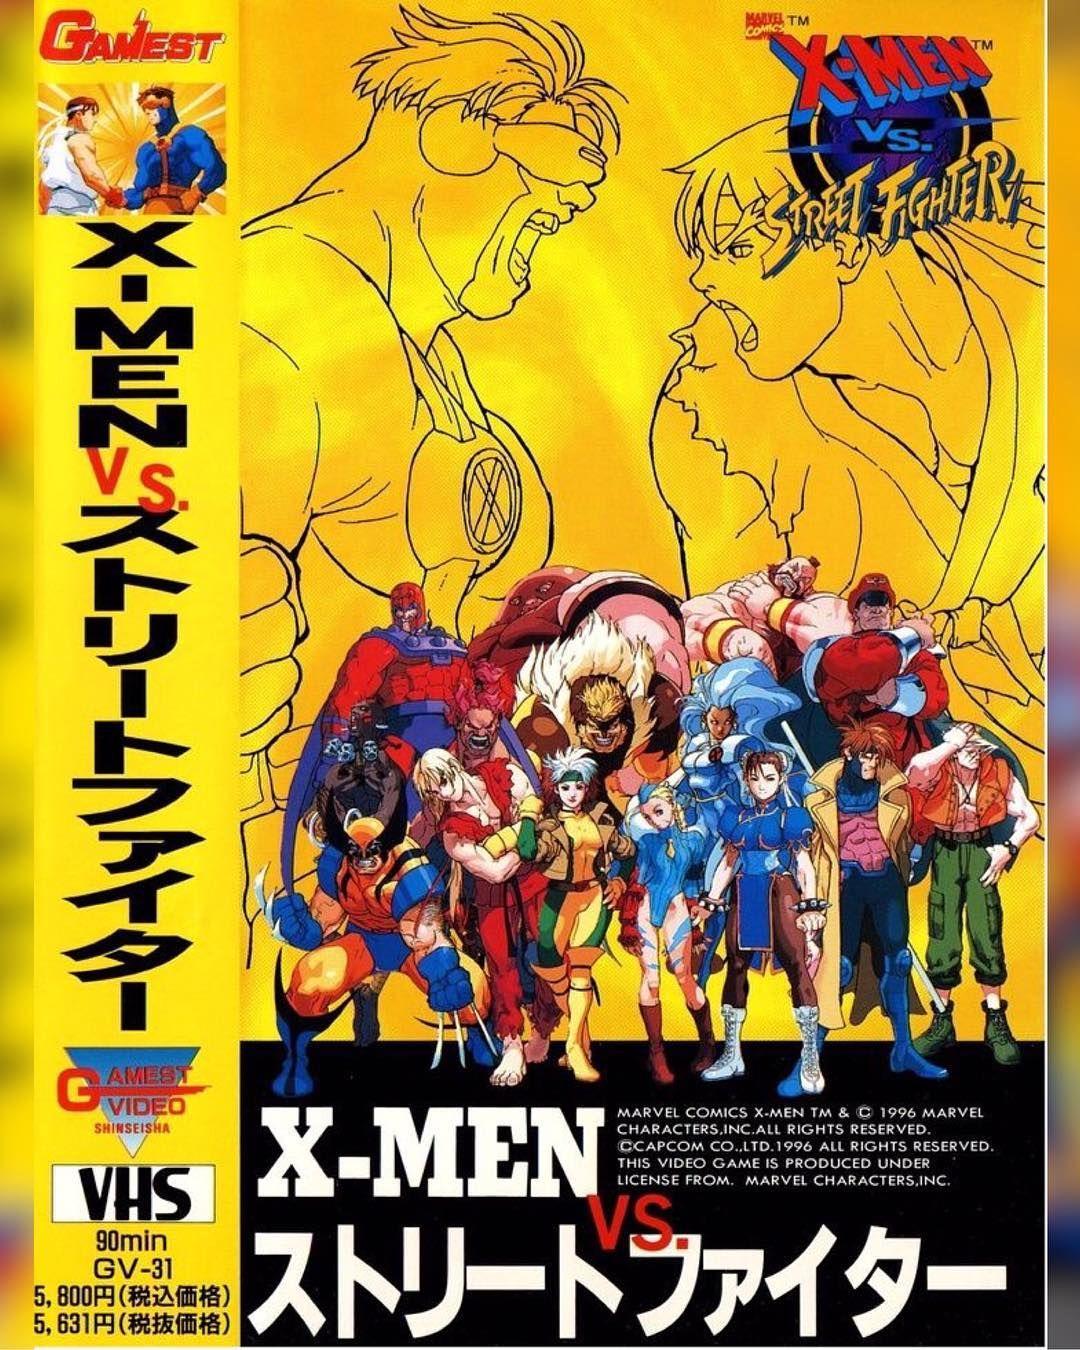 Still The Best Game X Men Vs Street Fighter Download Images At Nomoremutants Com Tumblr Com Key Film Dates Guardians O Capcom Art Capcom Vs Street Fighter